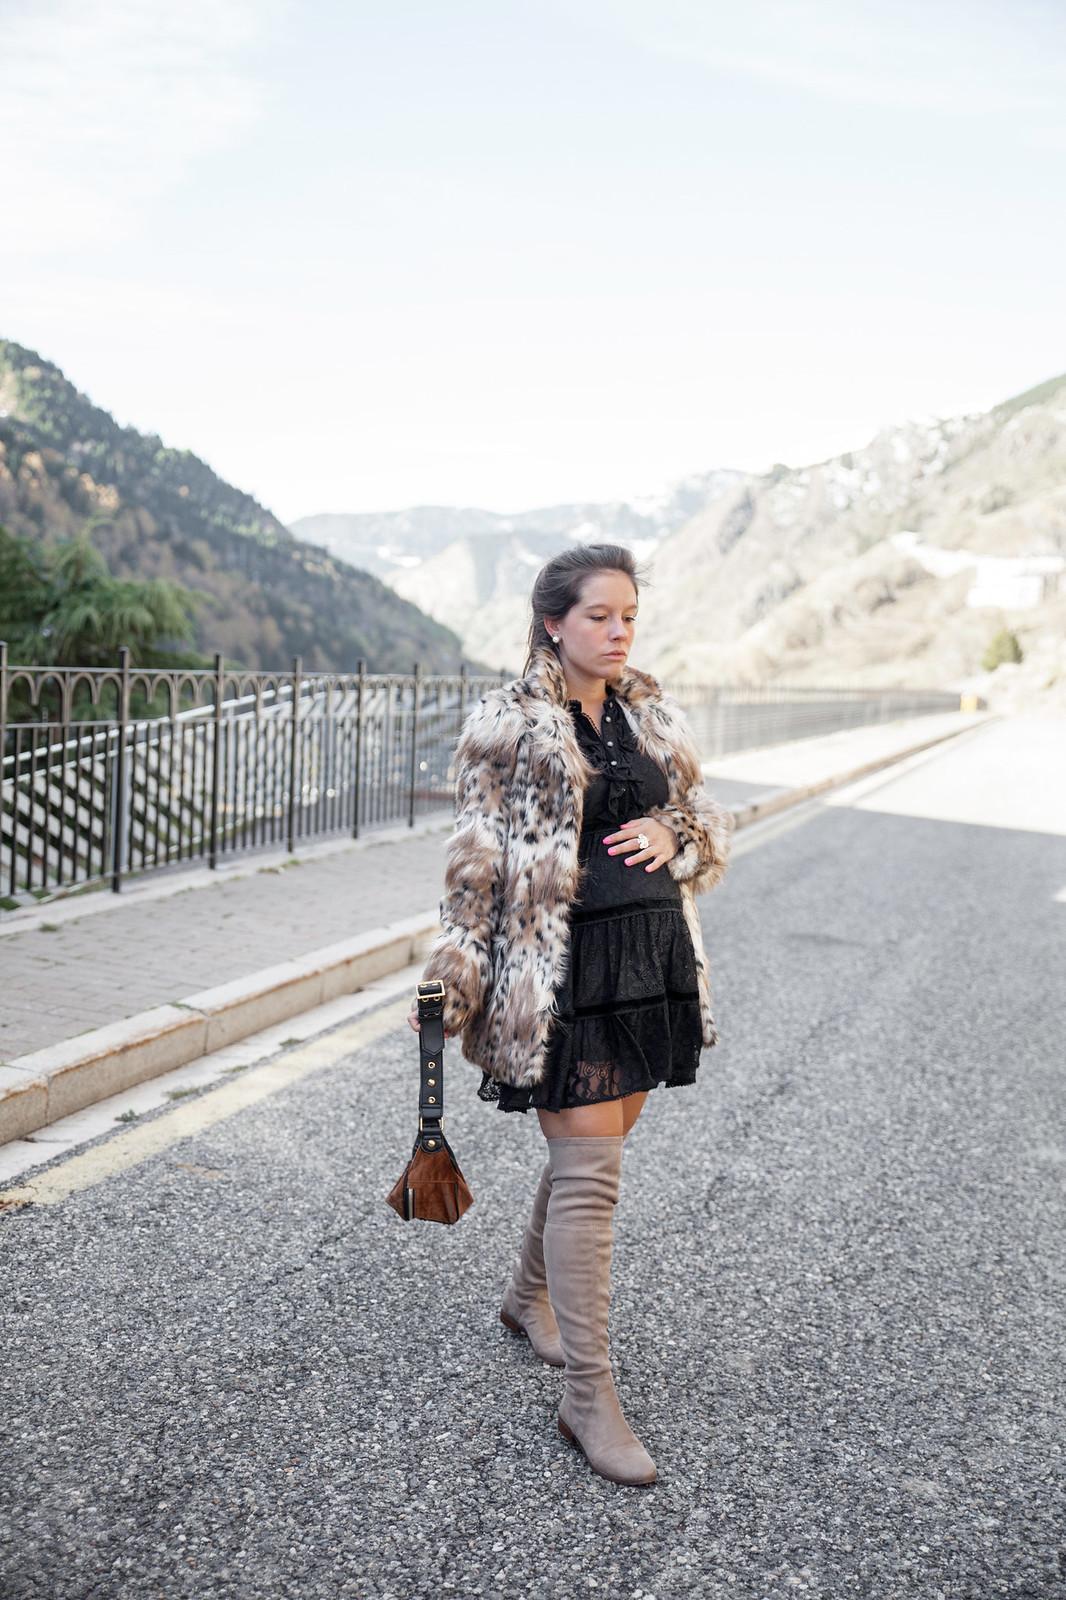 02_Leopard_print_coat_fur_majorelle_theguestgirl_highly_preppy_vestido_plumeti_little_black_dress_lbd_pregnant_chaqueta_leopardo_revolve